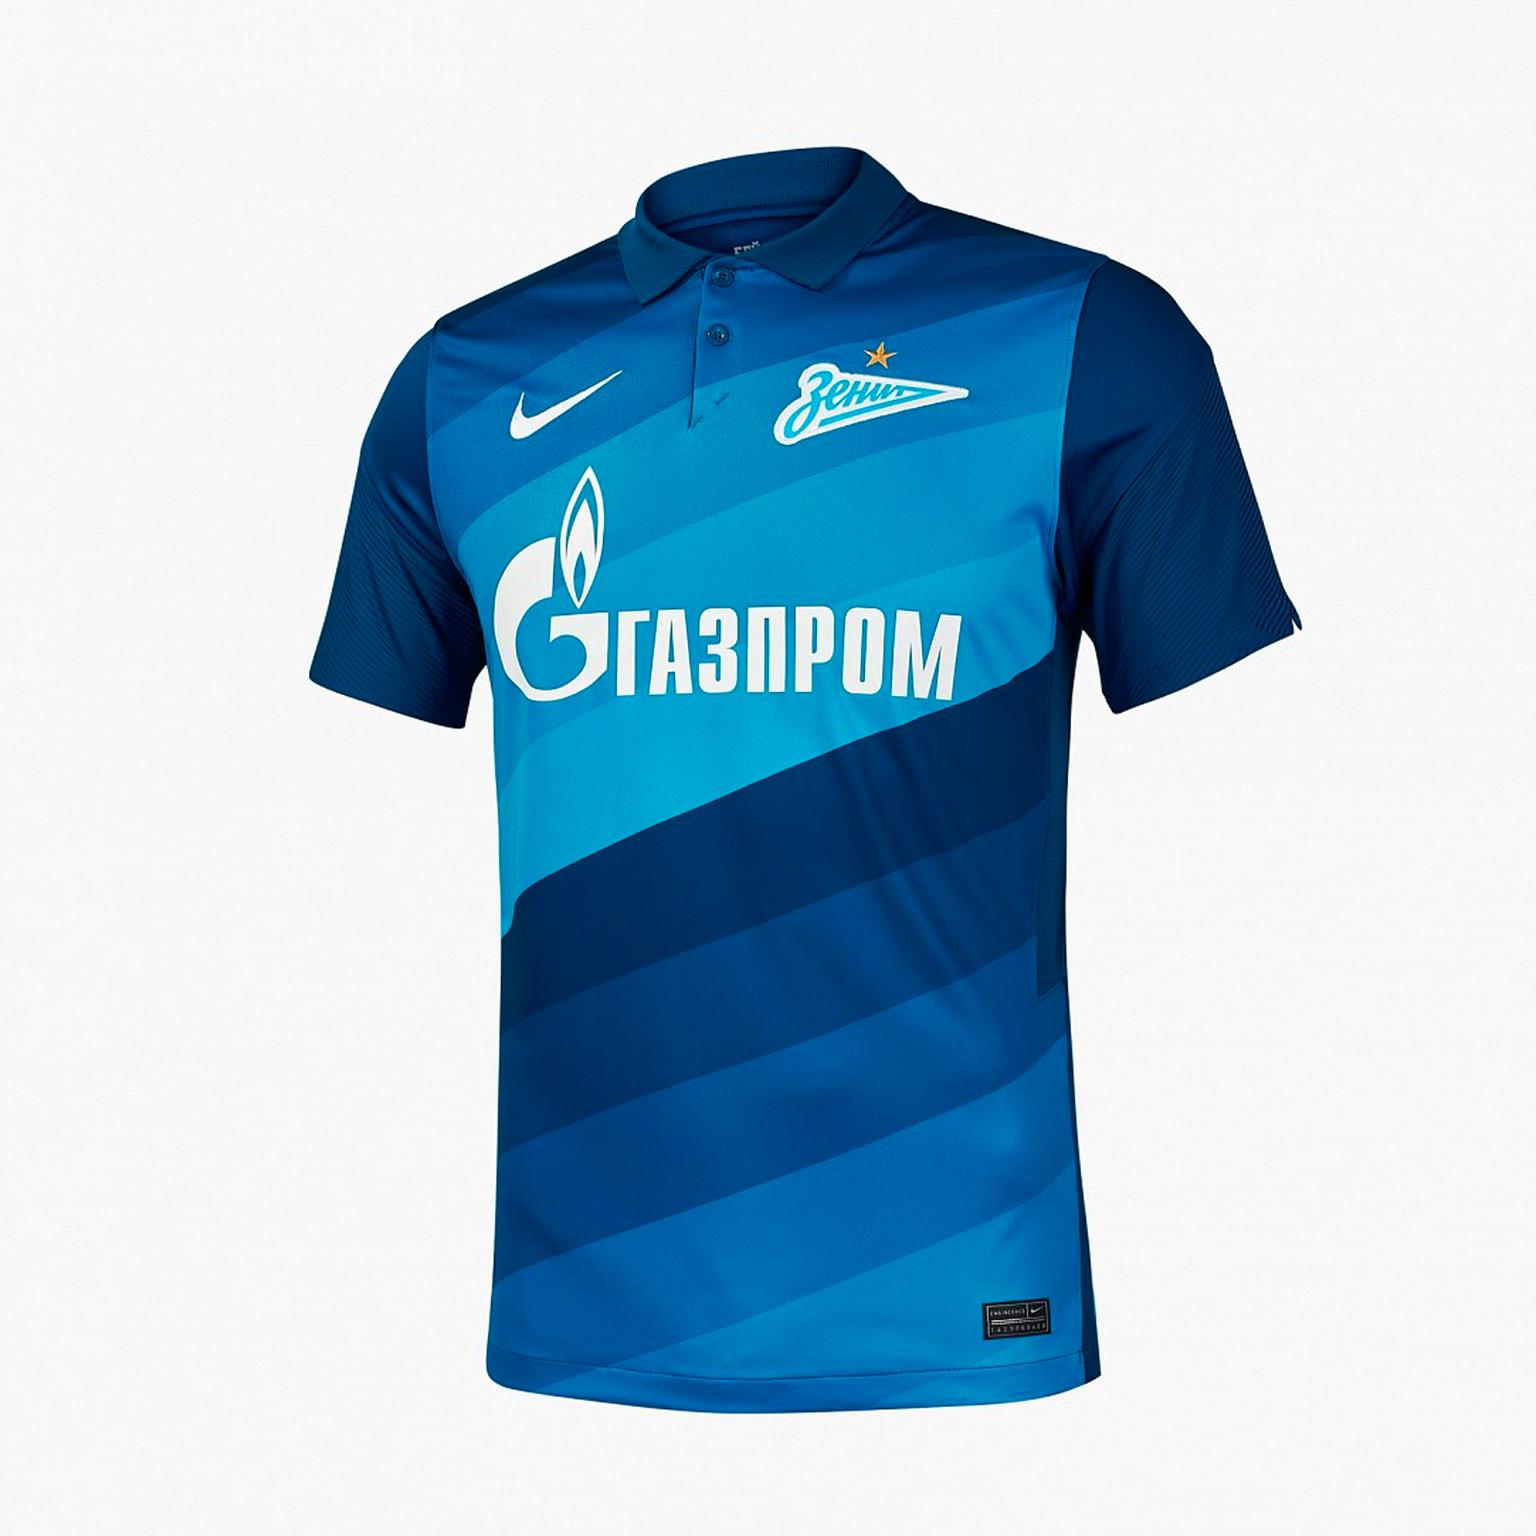 Фото - Домашняя игровая футболка Nike Зенит сезон 2020/21 выездная игровая футболка nike фк зенит 2019 20